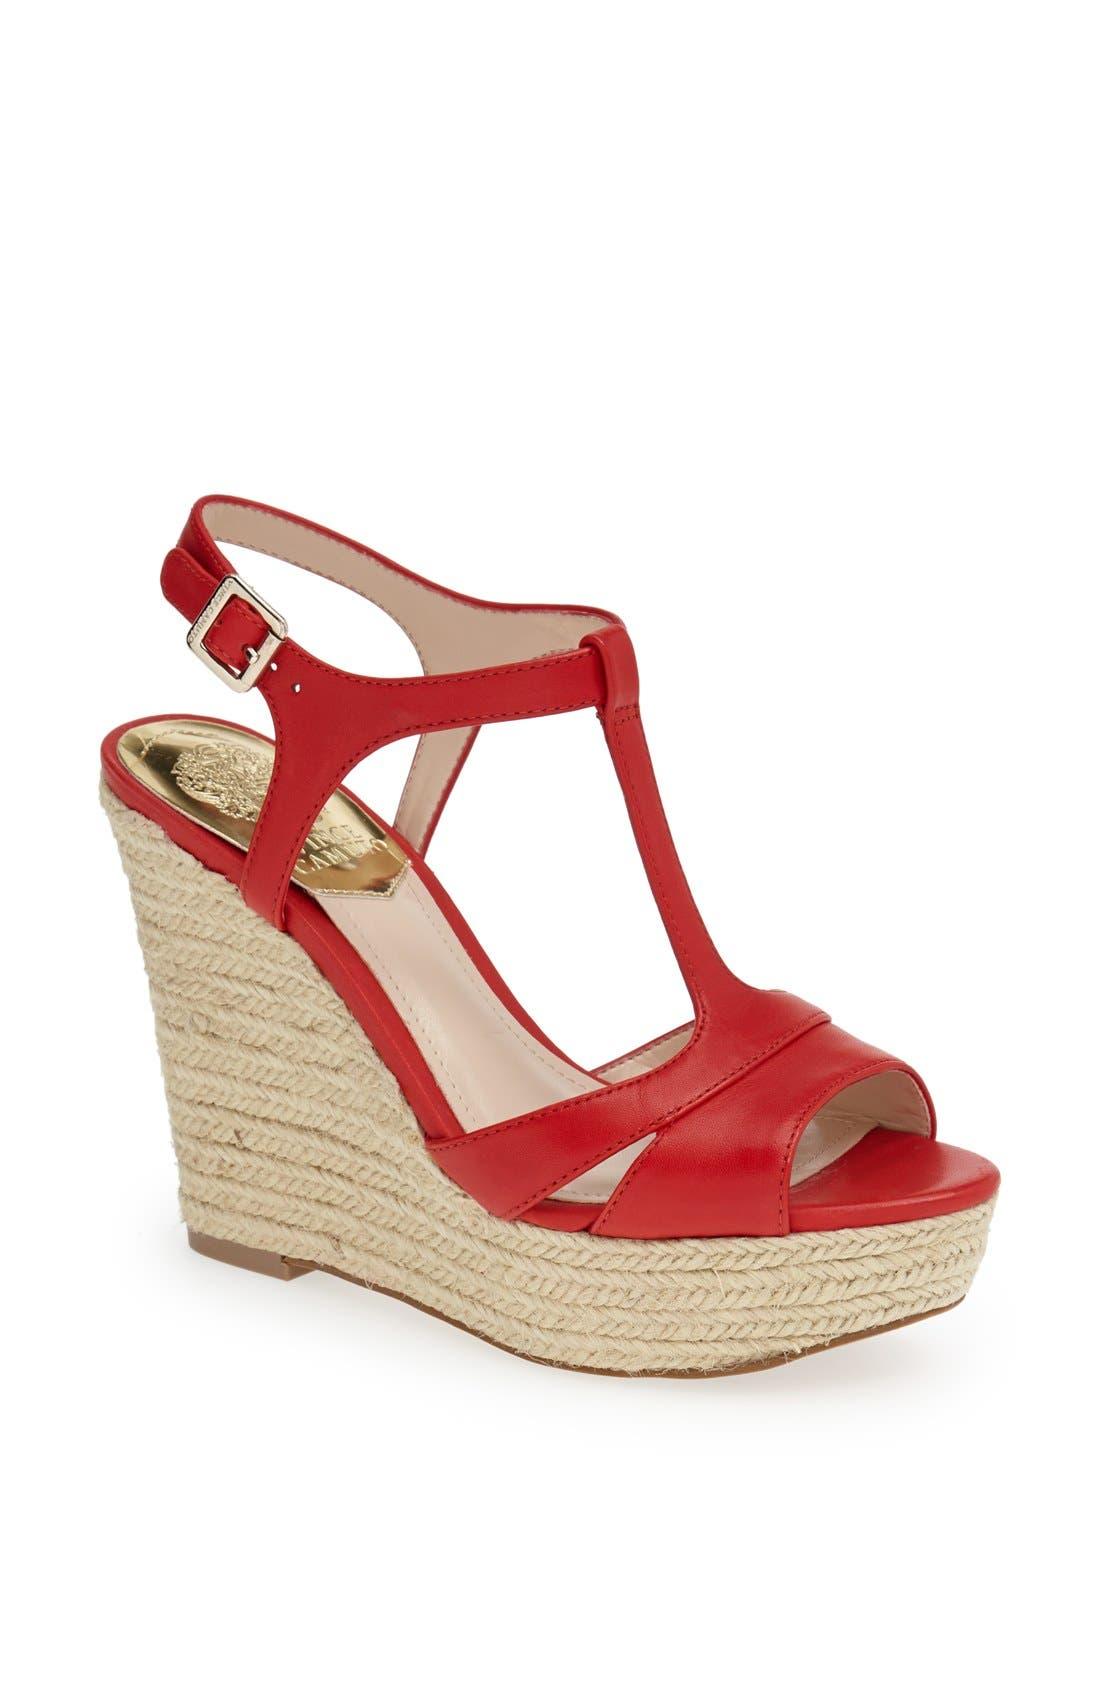 Main Image - Vince Camuto 'Inslo 2' Sandal